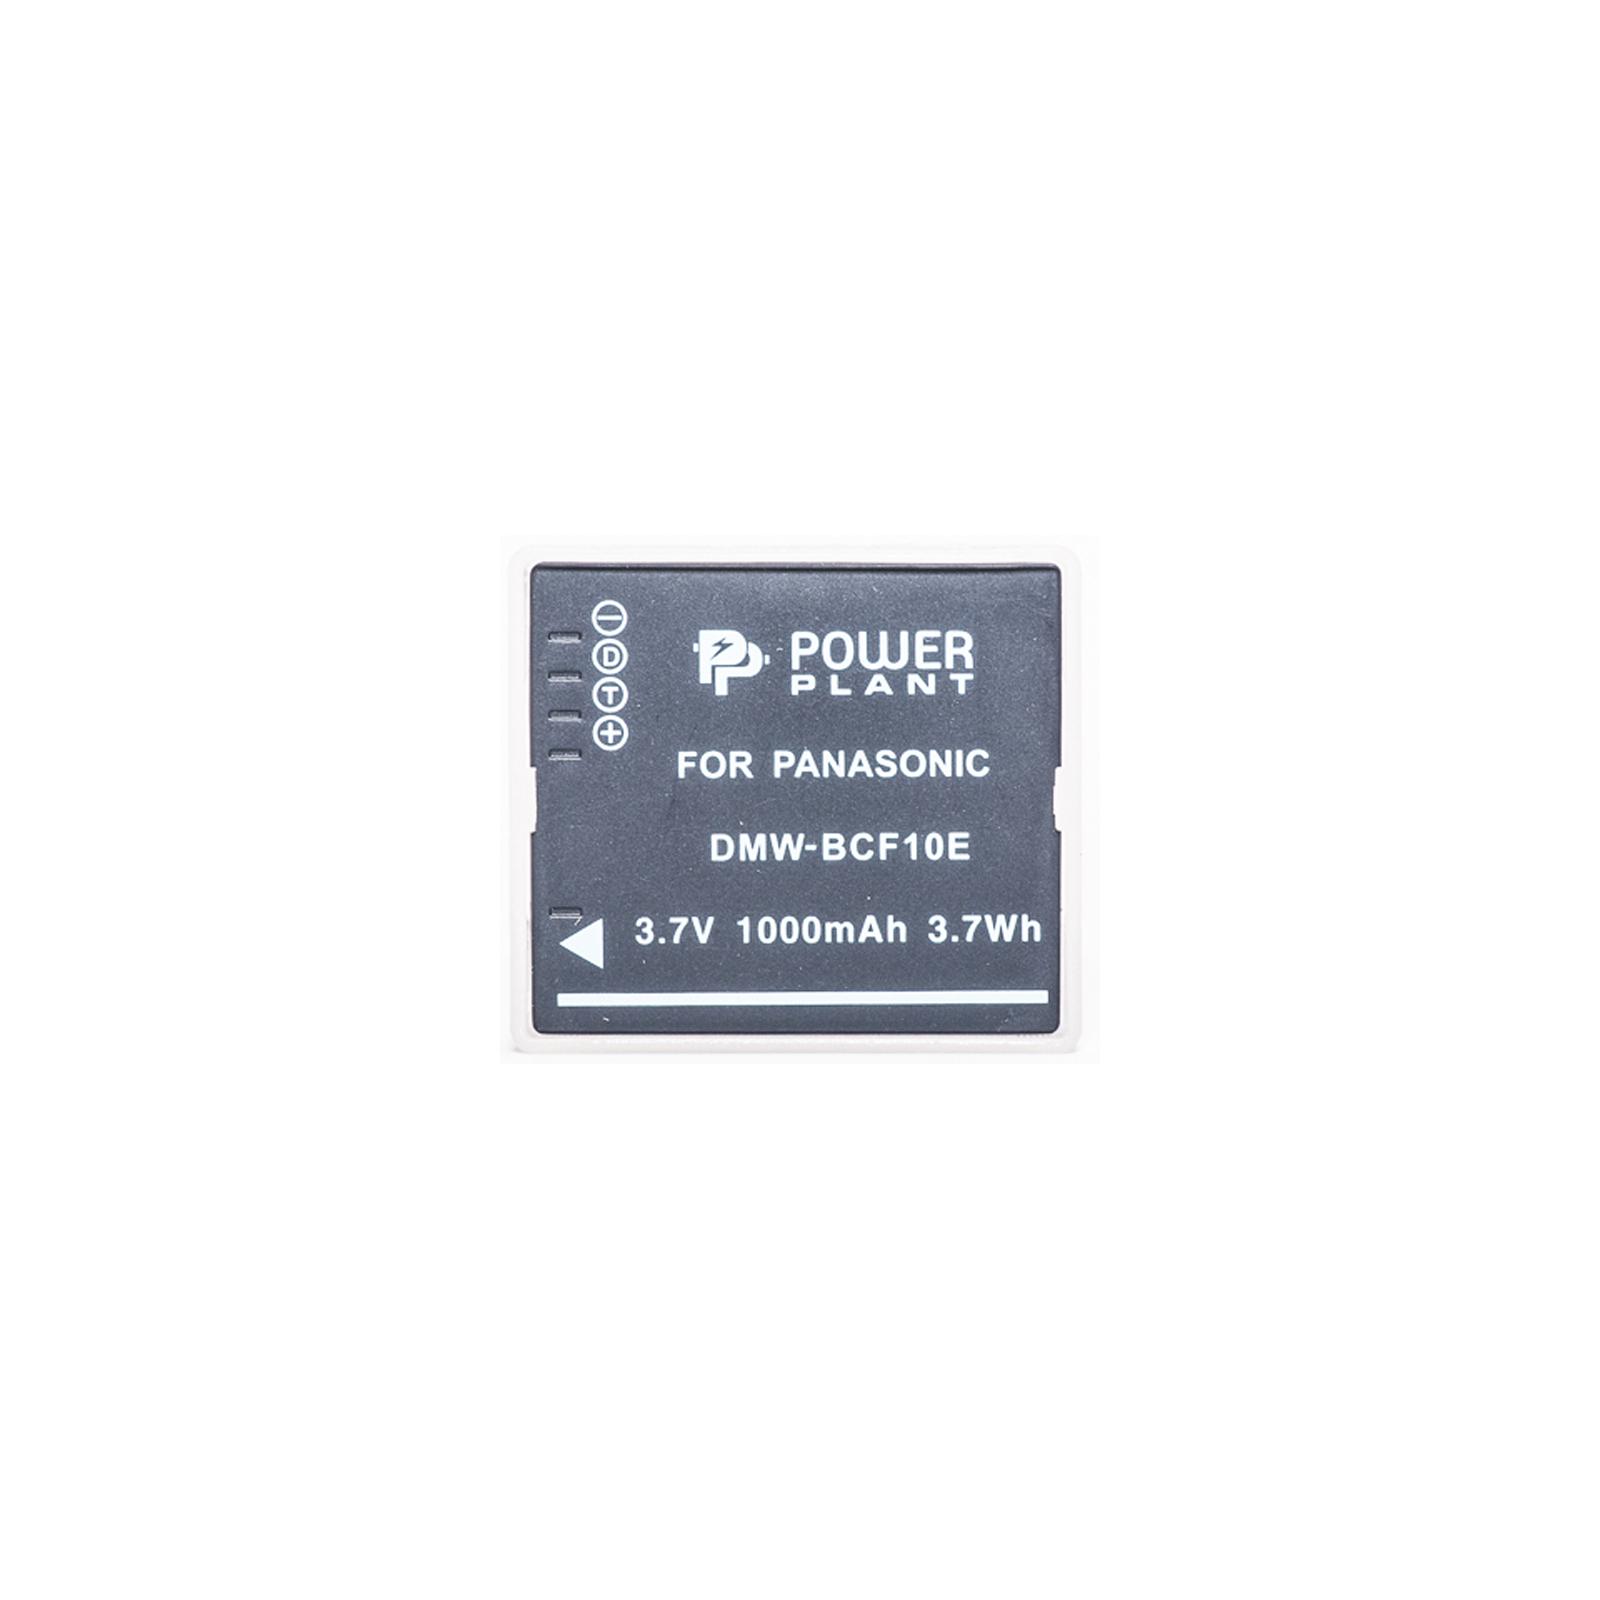 Аккумулятор к фото/видео PowerPlant Panasonic DMW-BCF10E (DV00DV1254) изображение 2